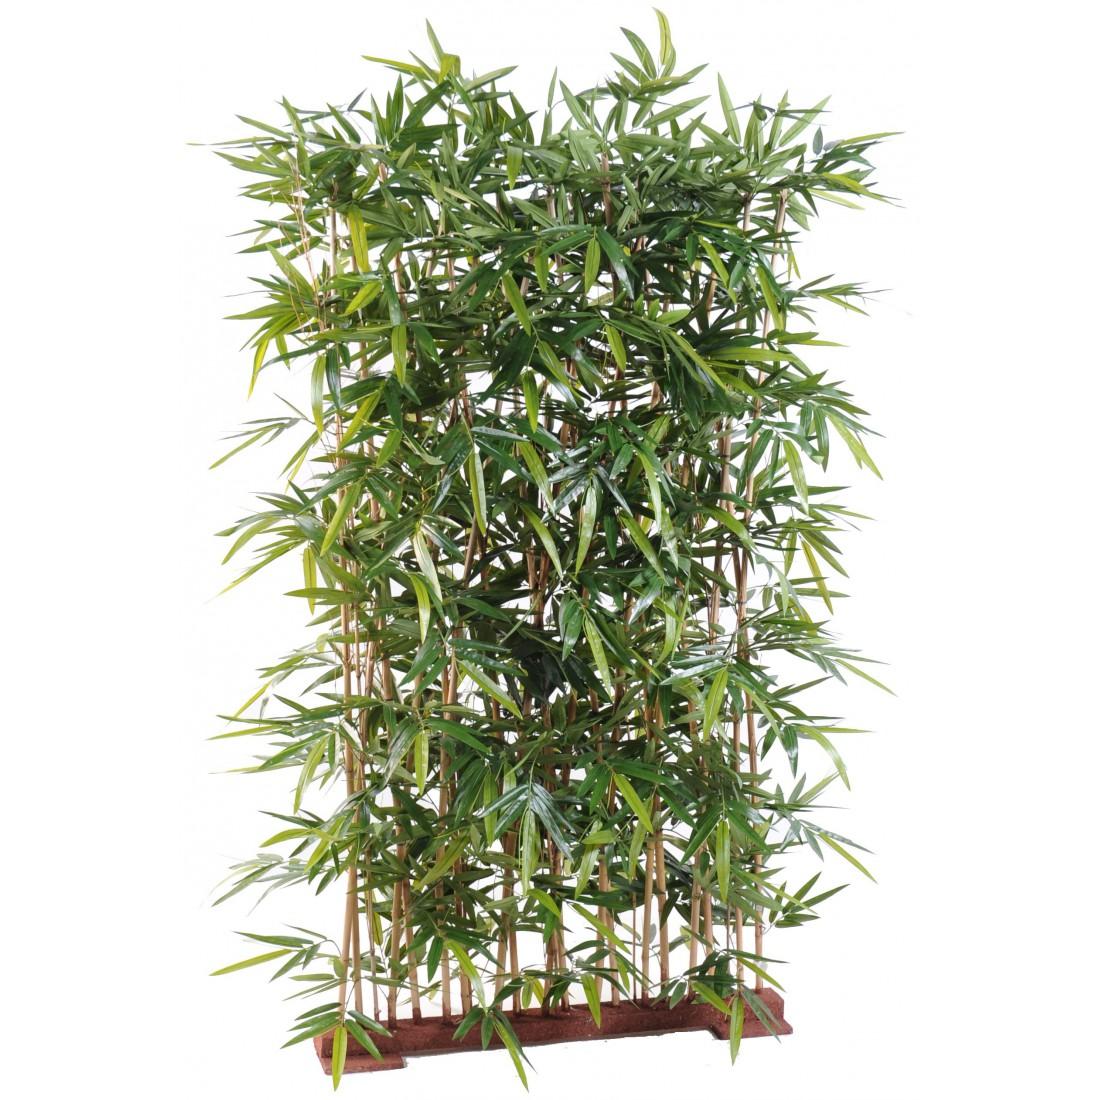 haie artificielle bambou new dense 180 cm topiaires. Black Bedroom Furniture Sets. Home Design Ideas